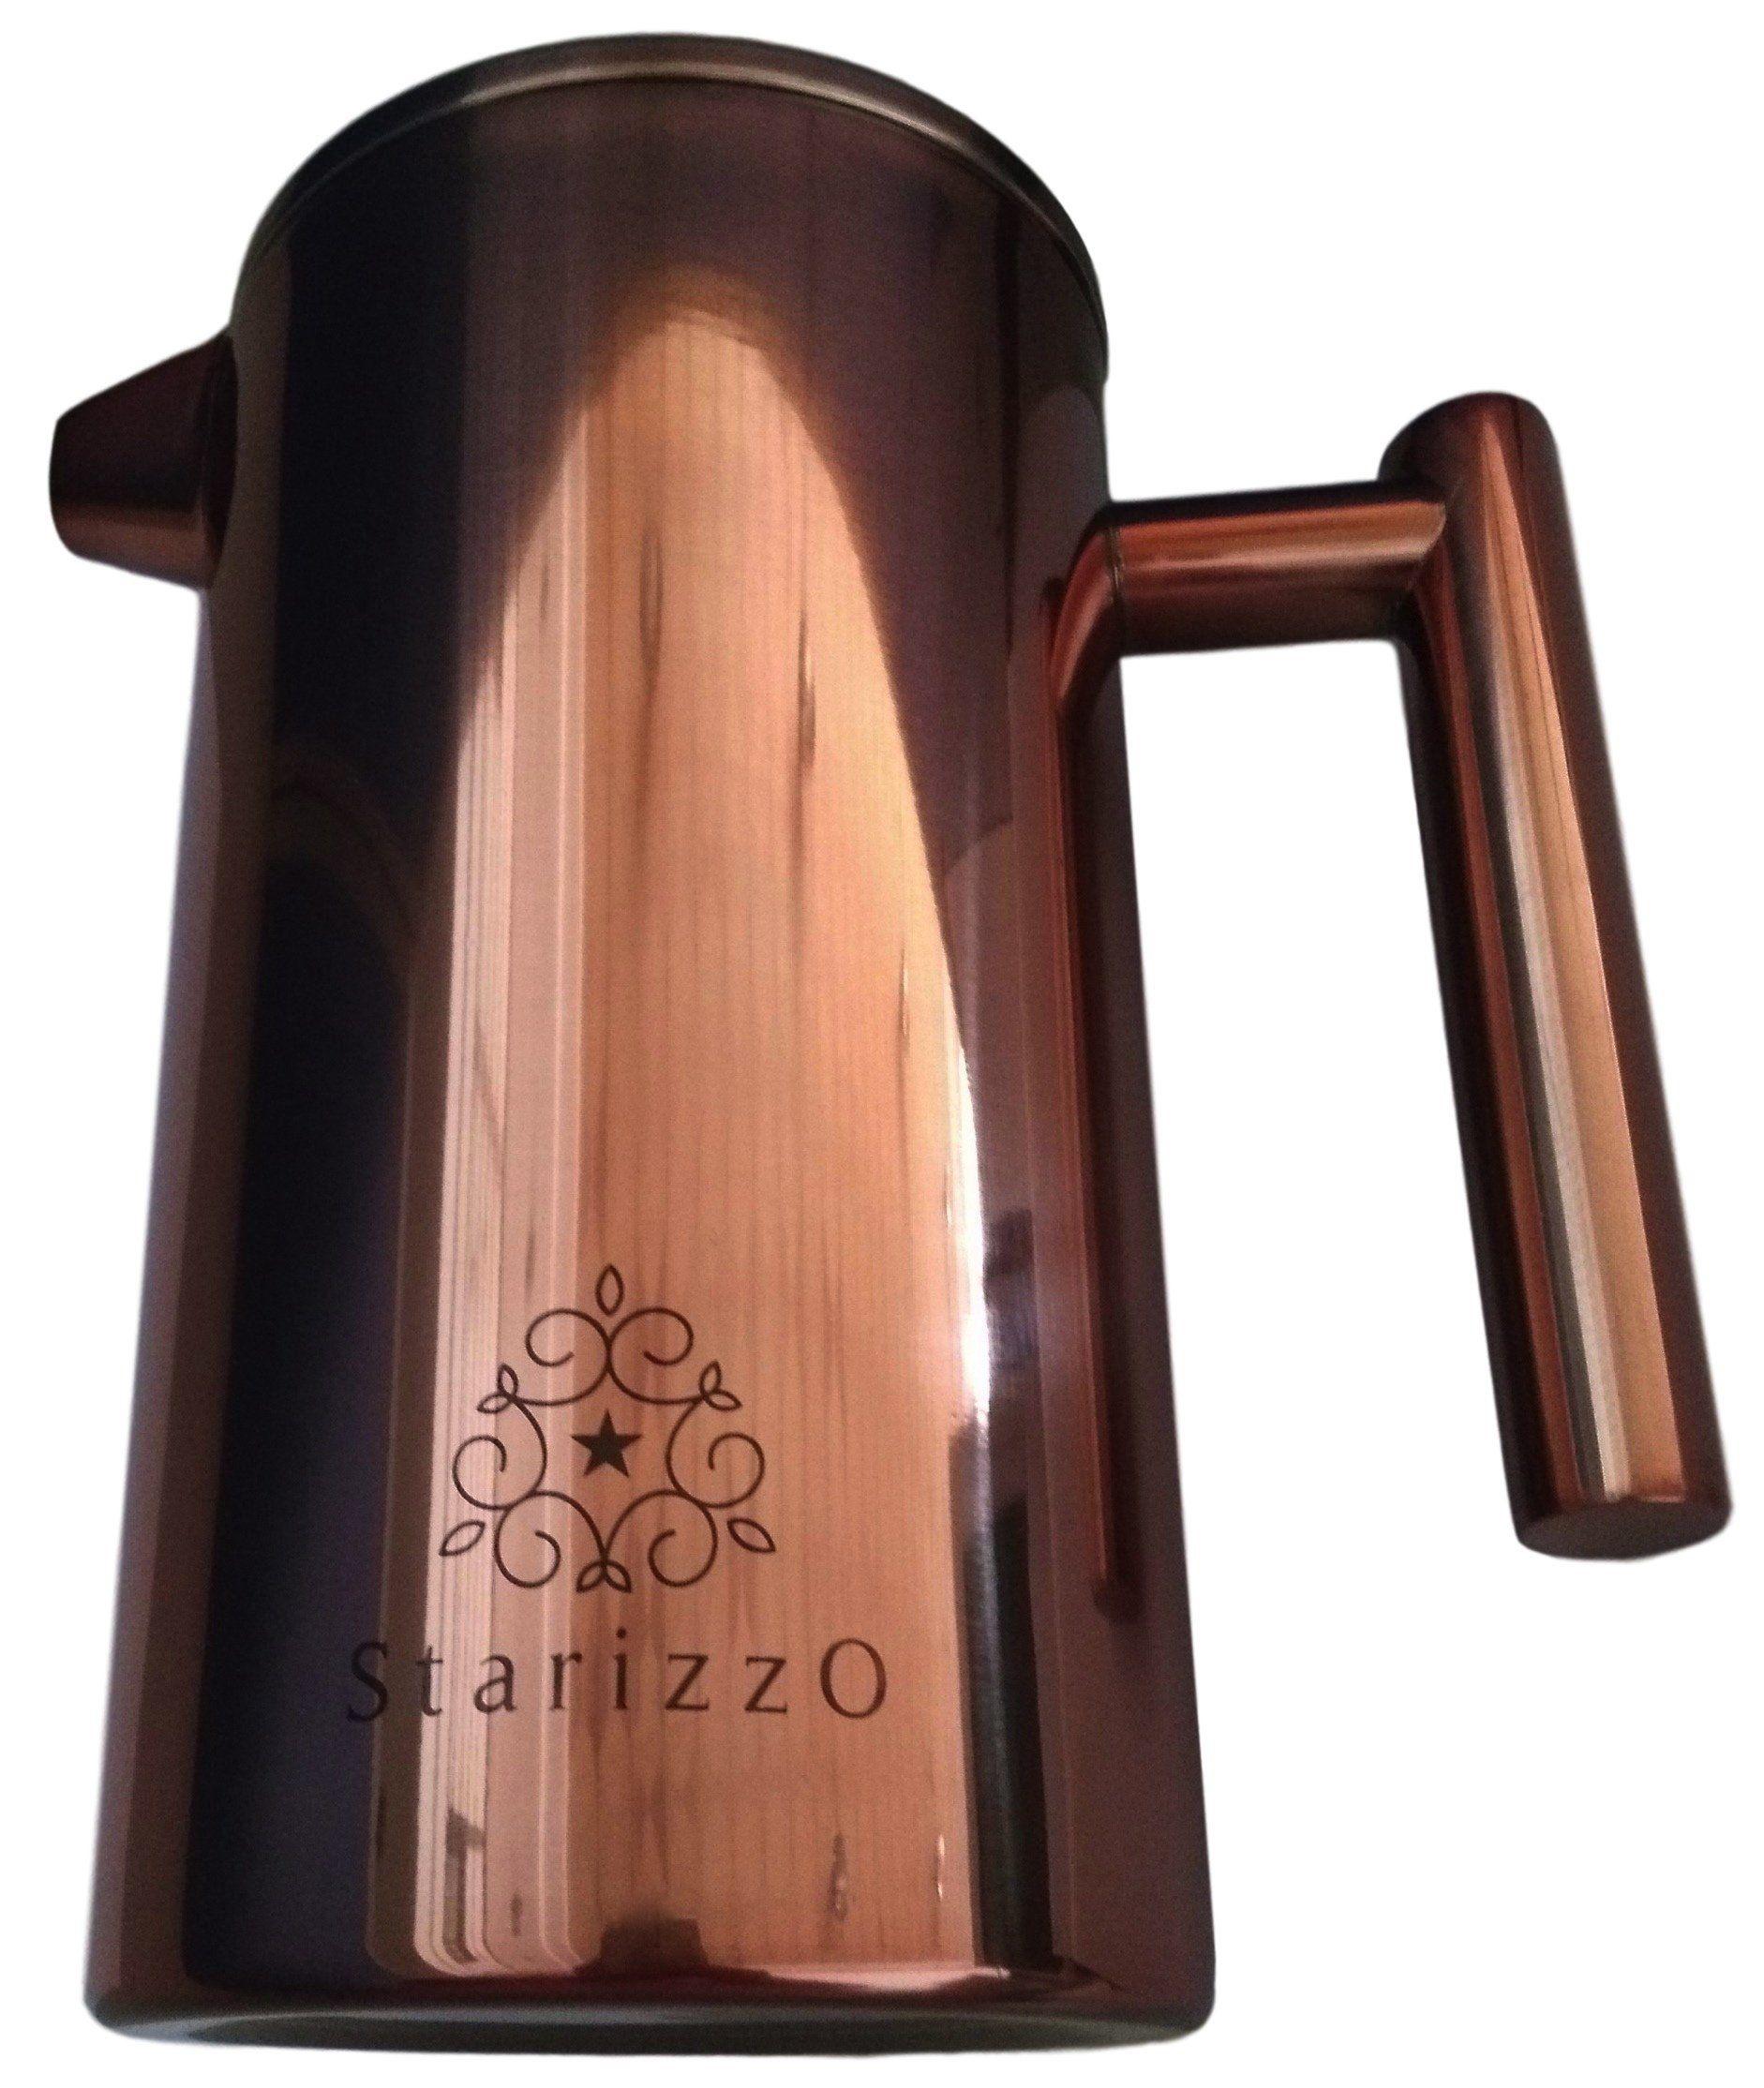 French press coffee maker with beautiful copper finish premium